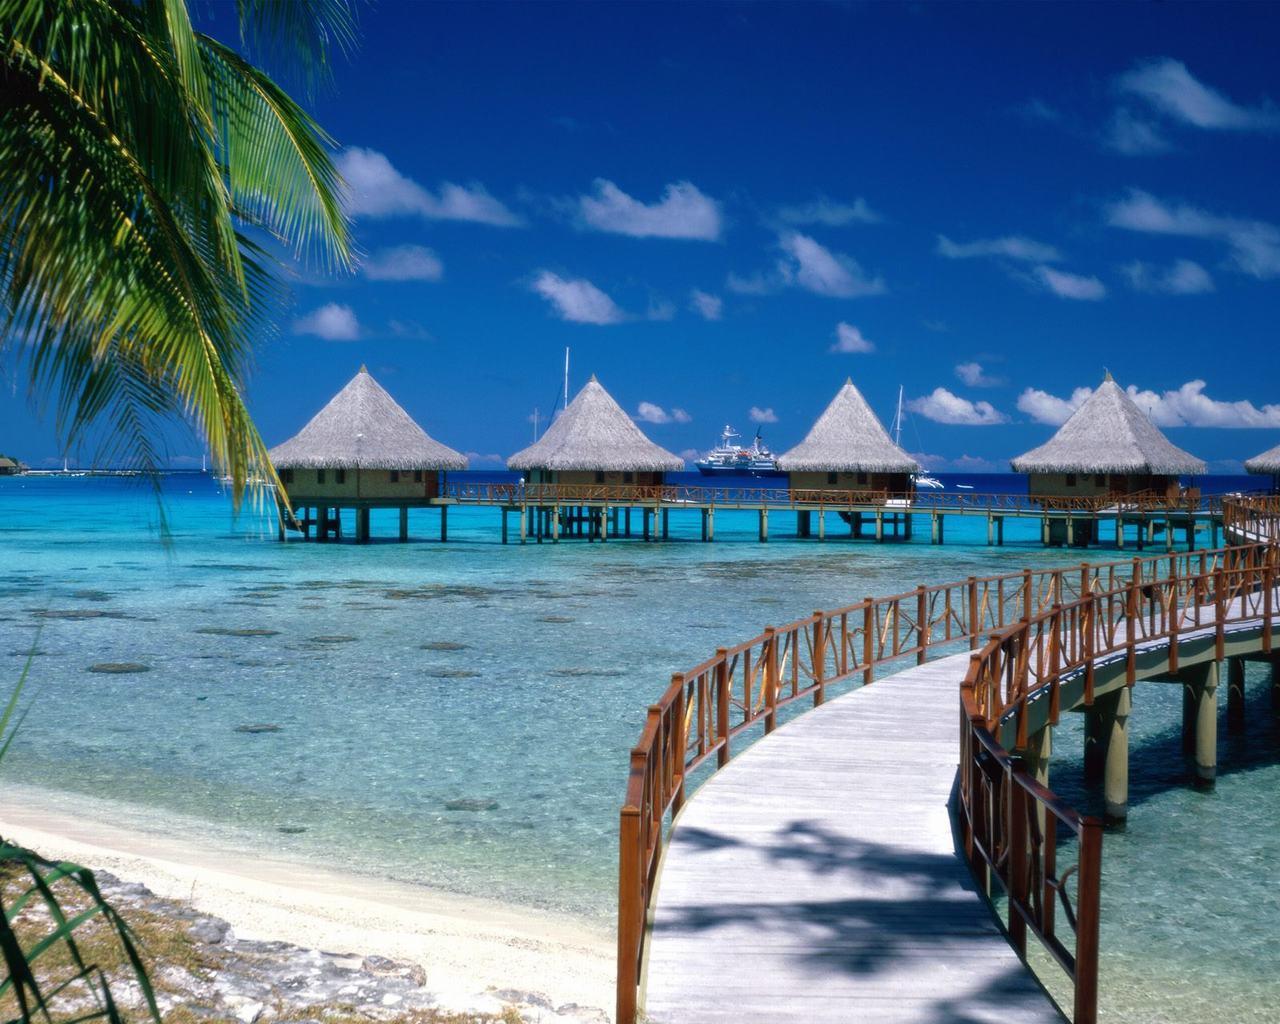 tropical island beach scenery palace for Sunbathing desktop wallpaper 1280x1024